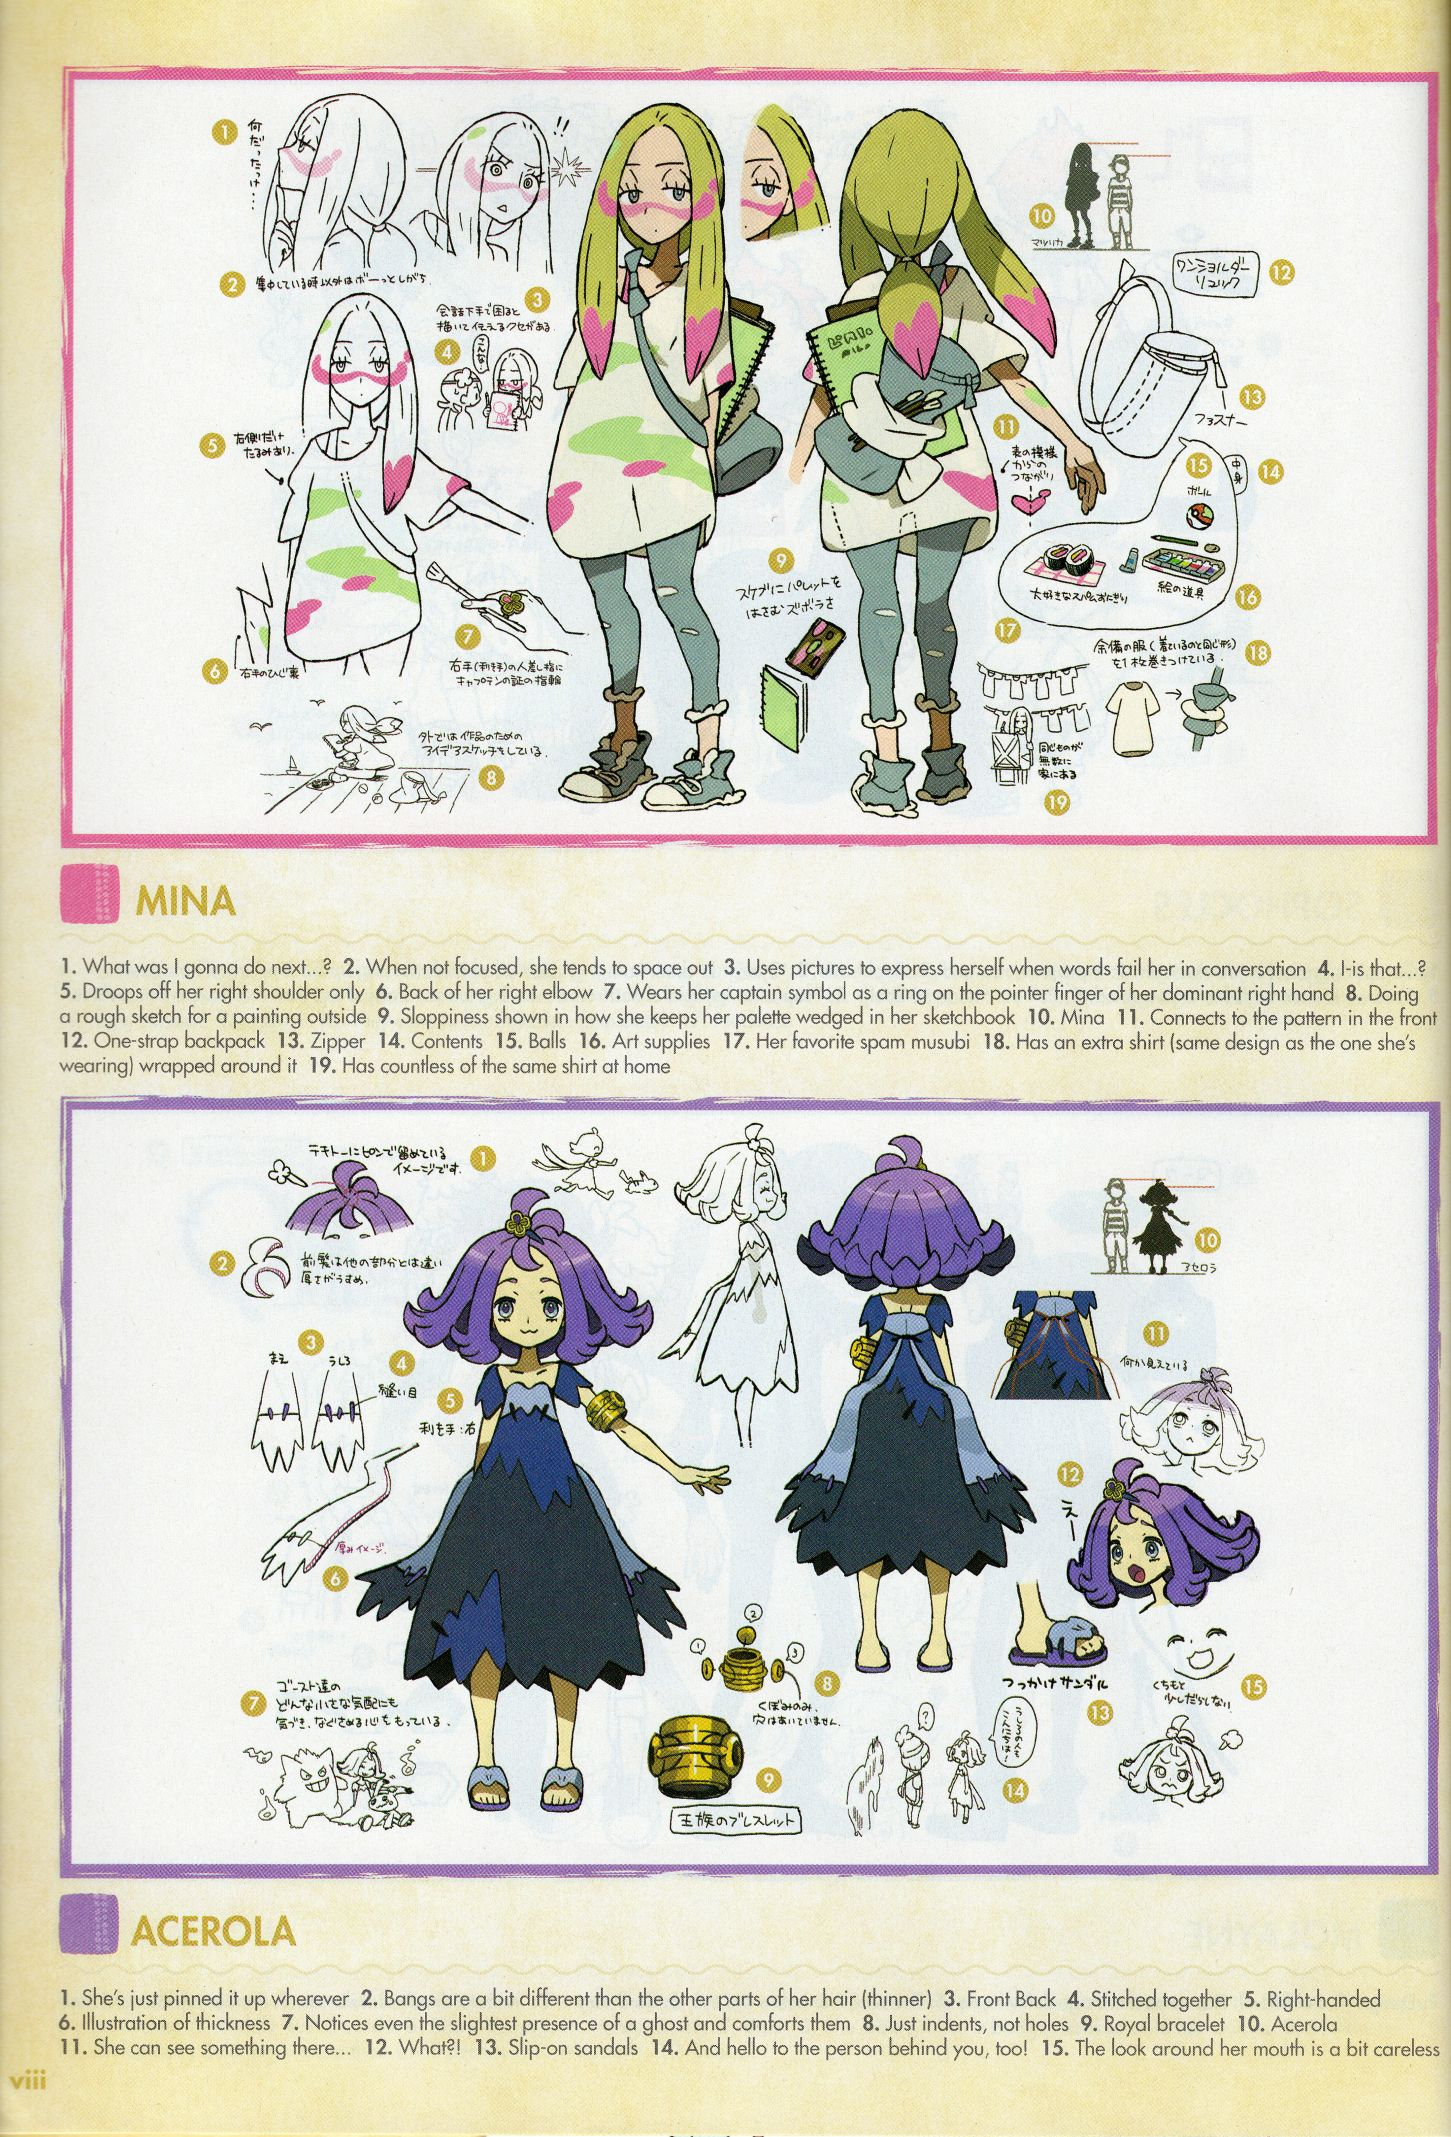 pokémon sun/moon - trial captains mina and acerola   ポケモン